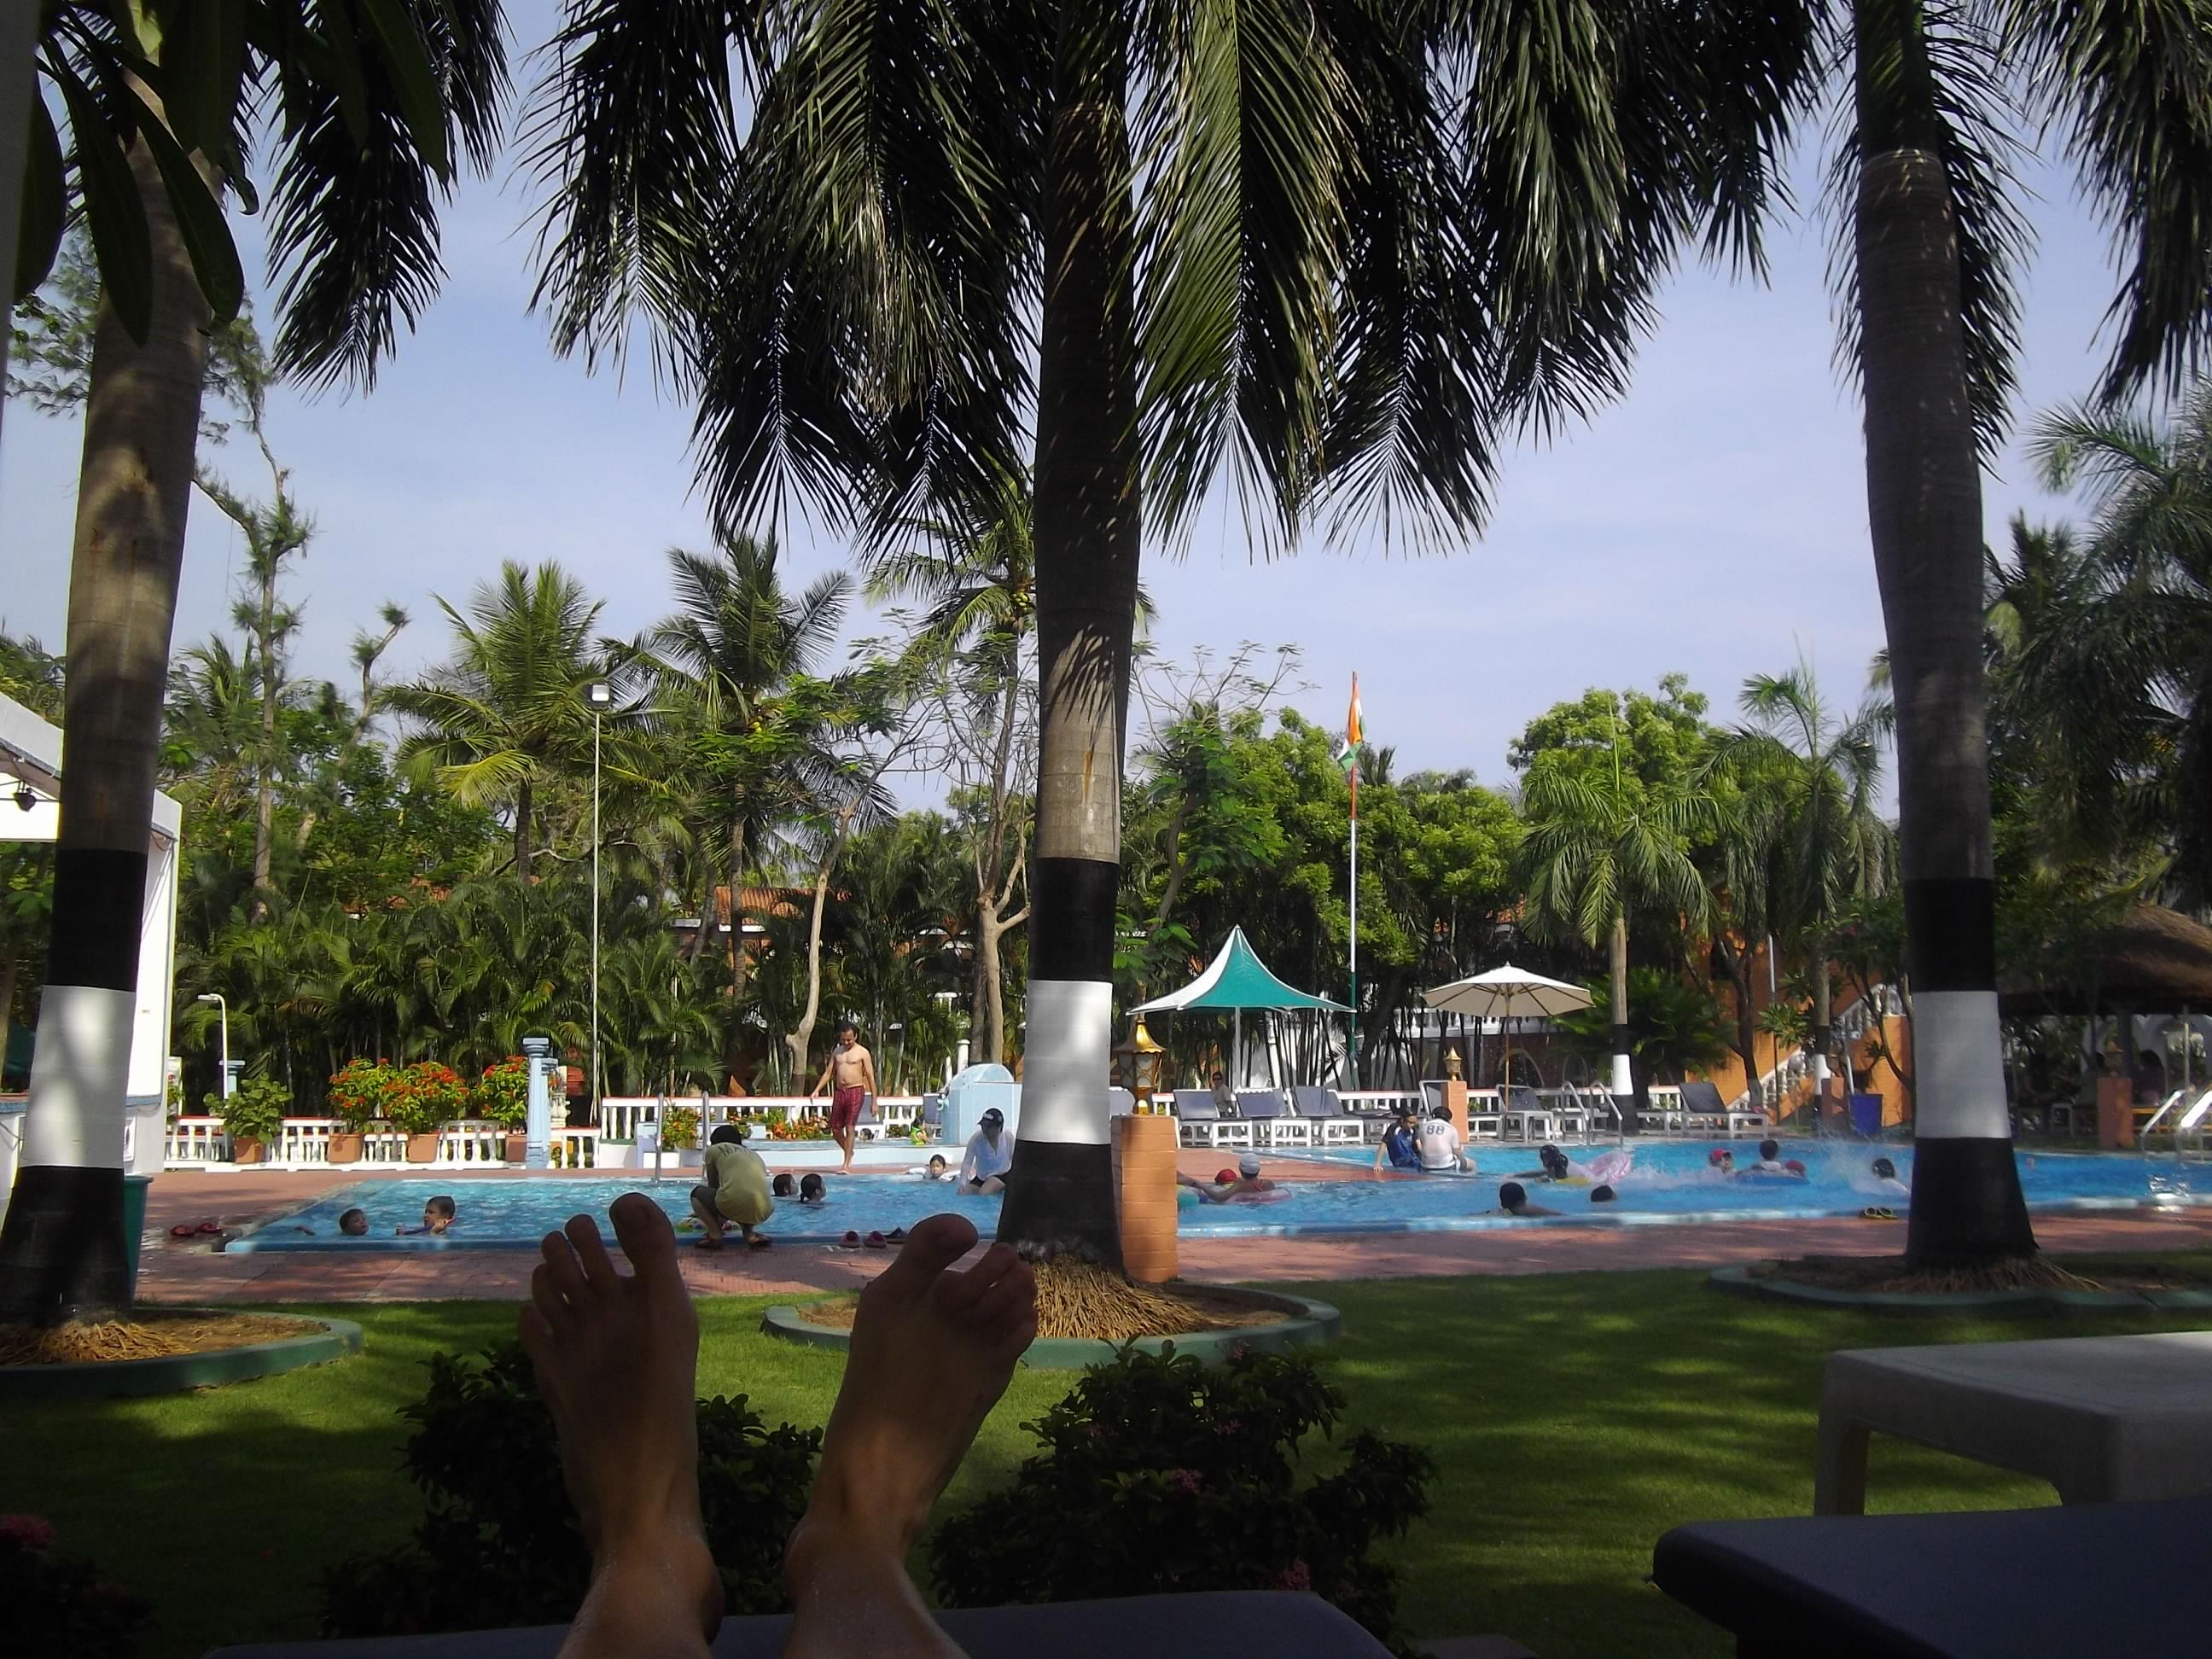 india ideal beach resort chennai